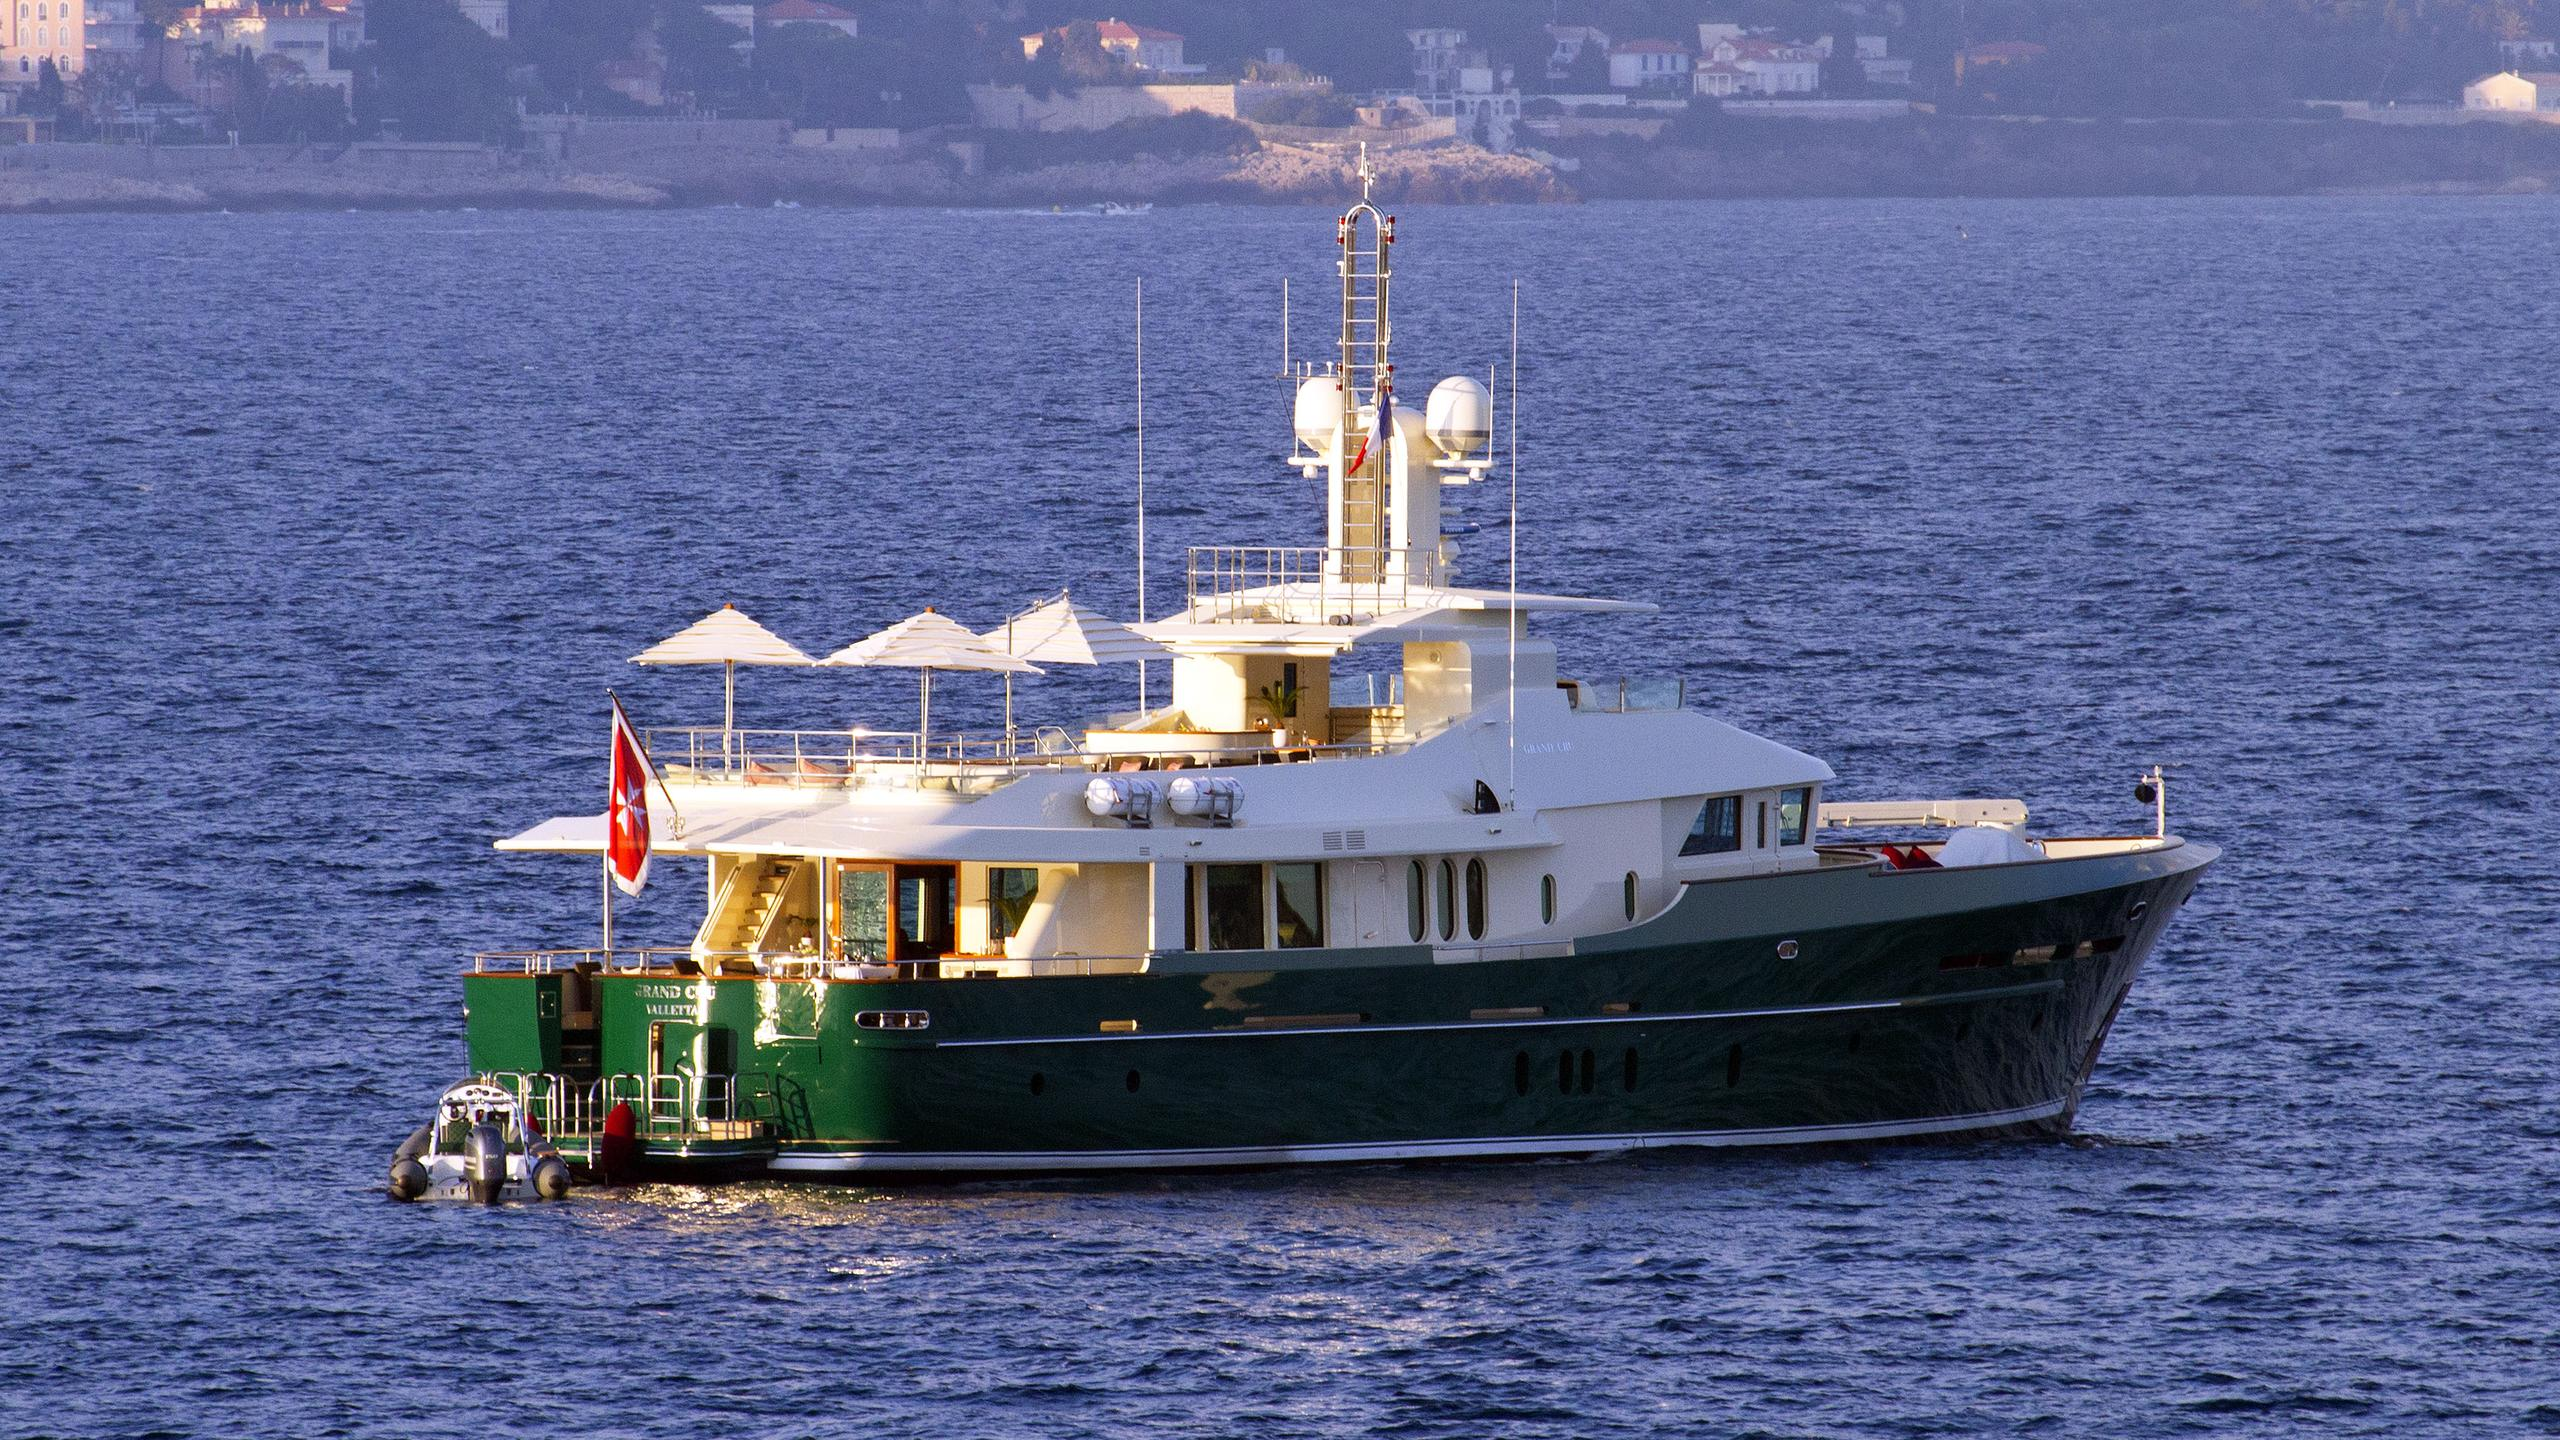 beverley grand cru iii motoryacht benetti sd 115 2009 37m half stern